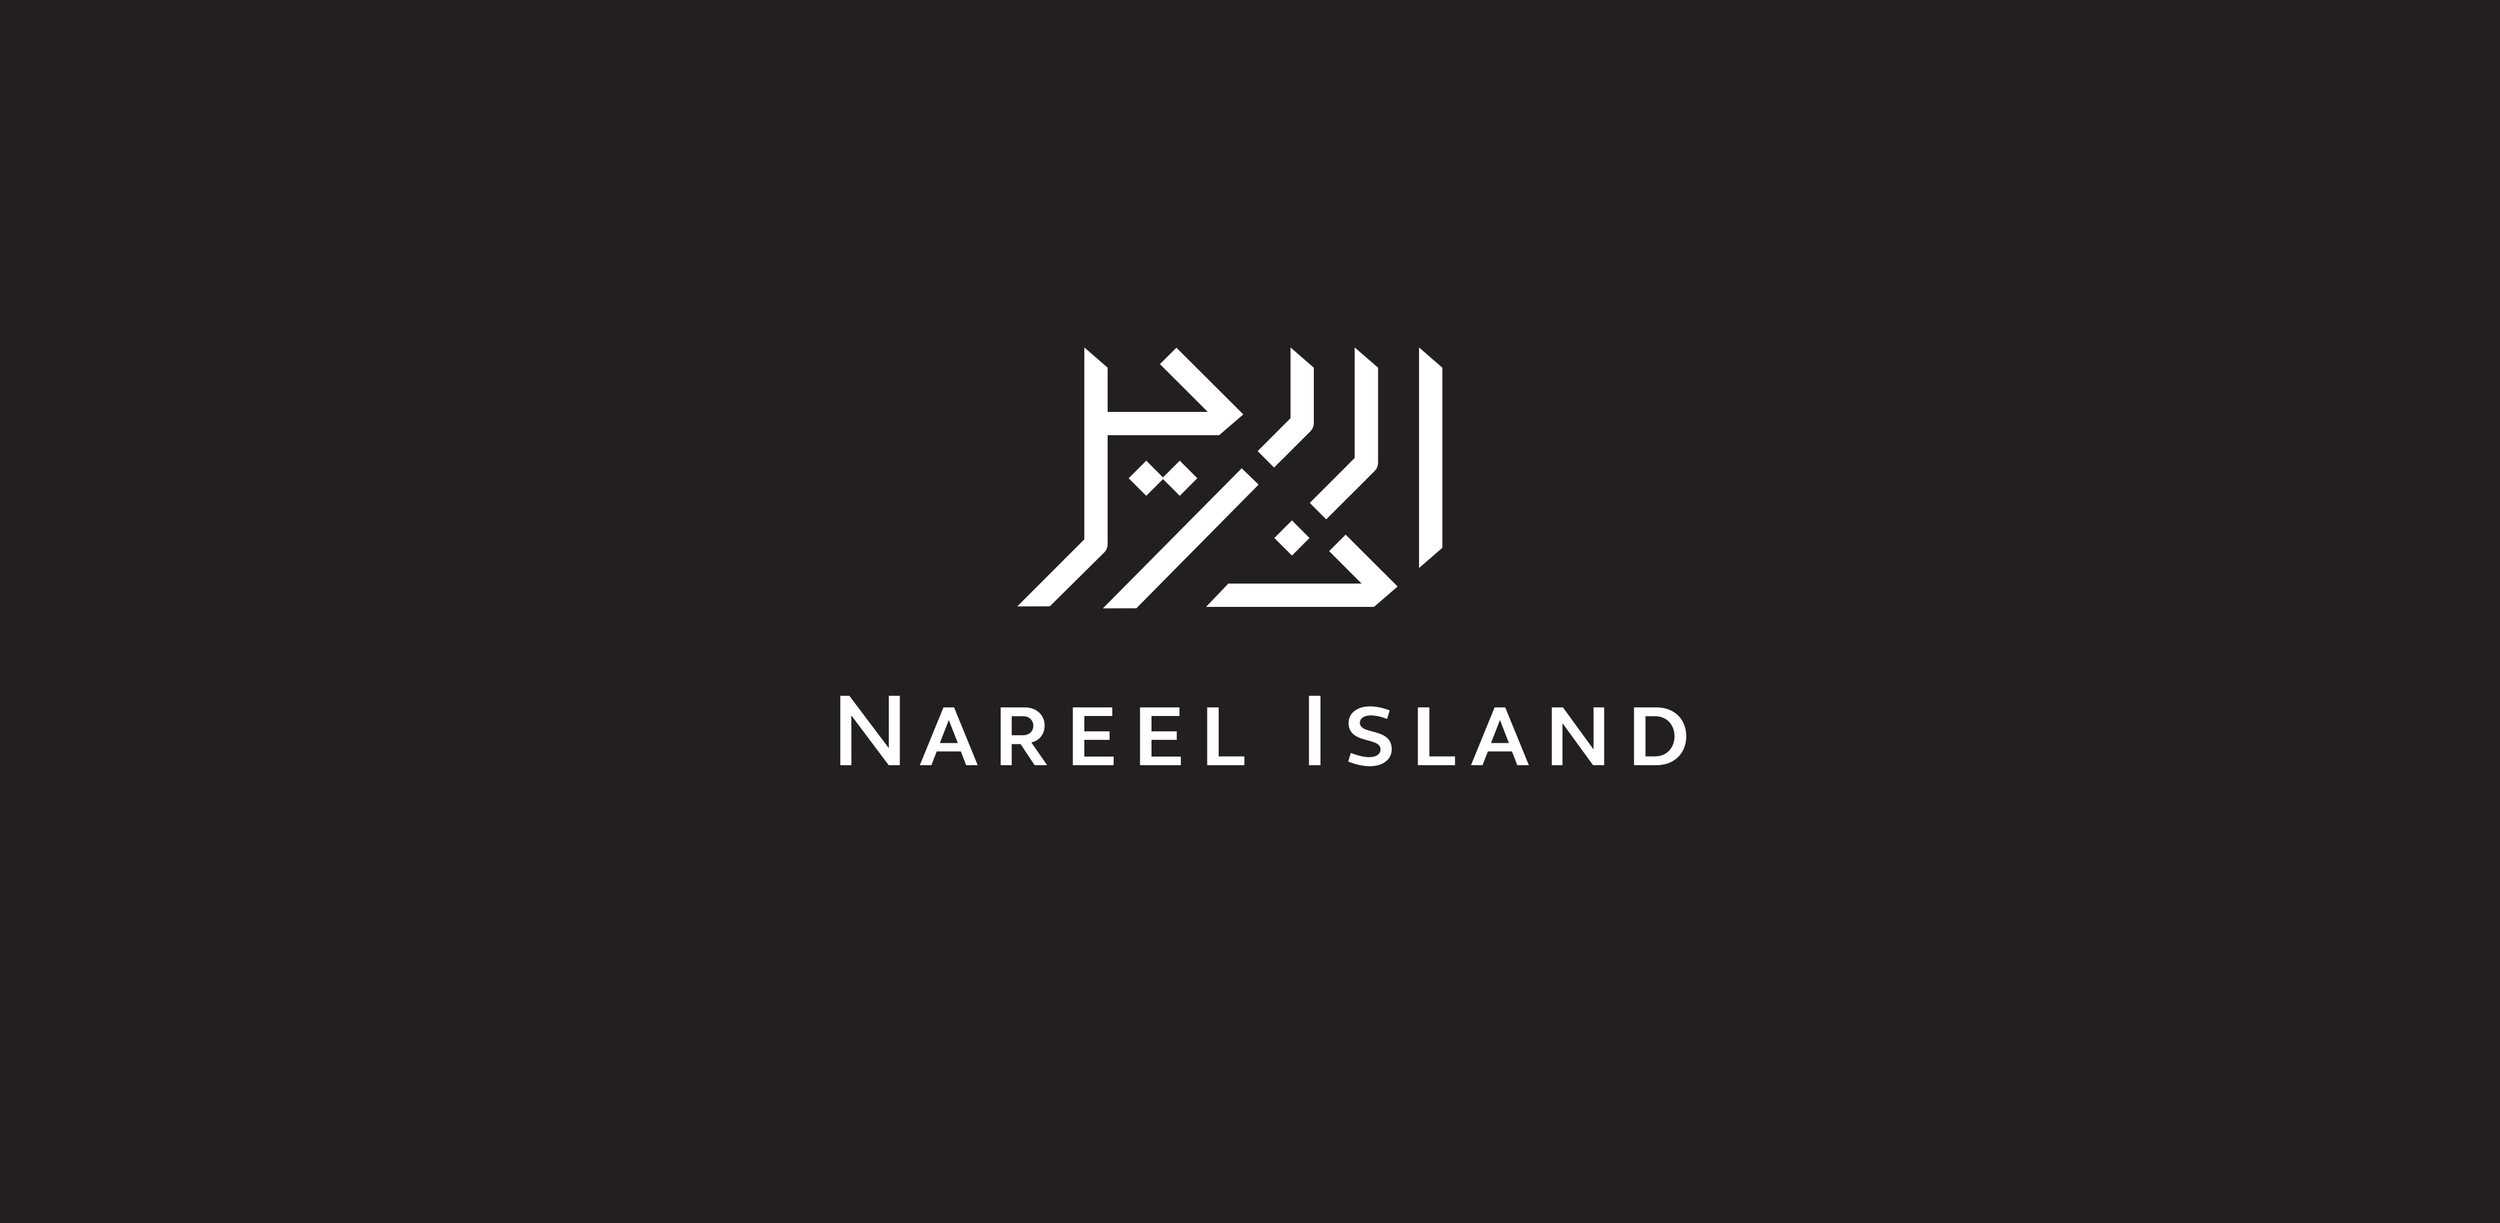 NareelIsland_2.jpg